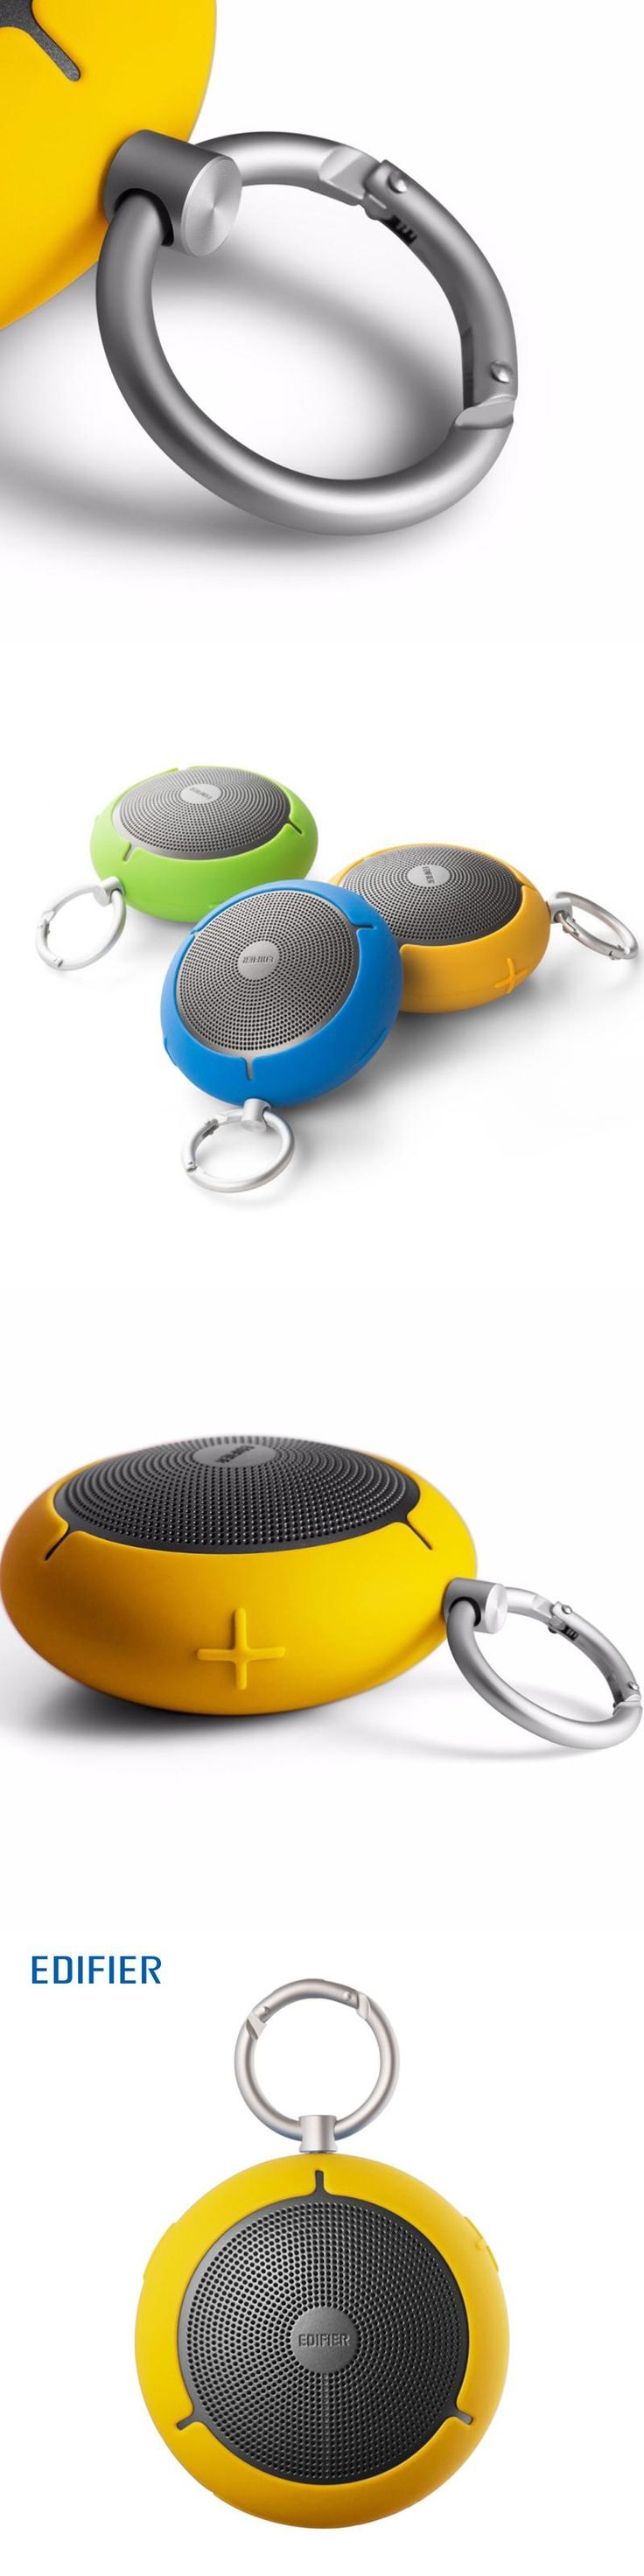 Edifier MP100 Portable Bluetooth Speaker Wireless Dust Proof & Splash Proof Speaker MicroSD Functionality Powerful Speakers